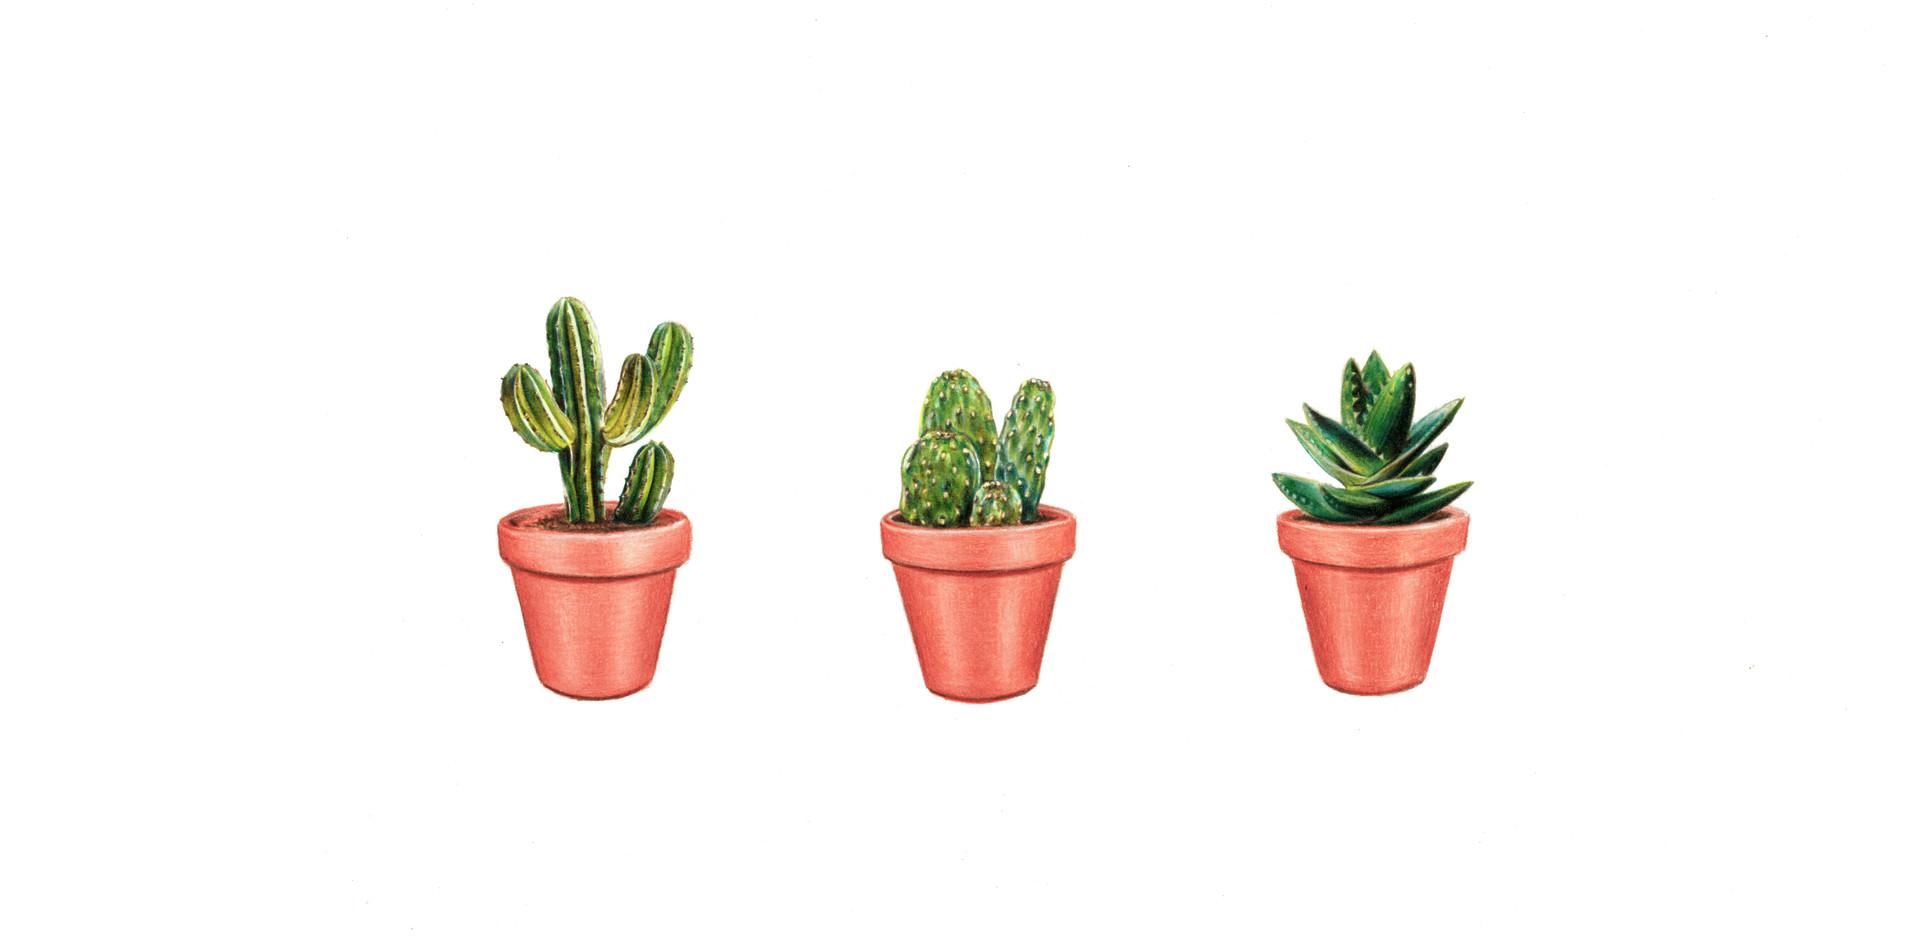 threecactus.jpg